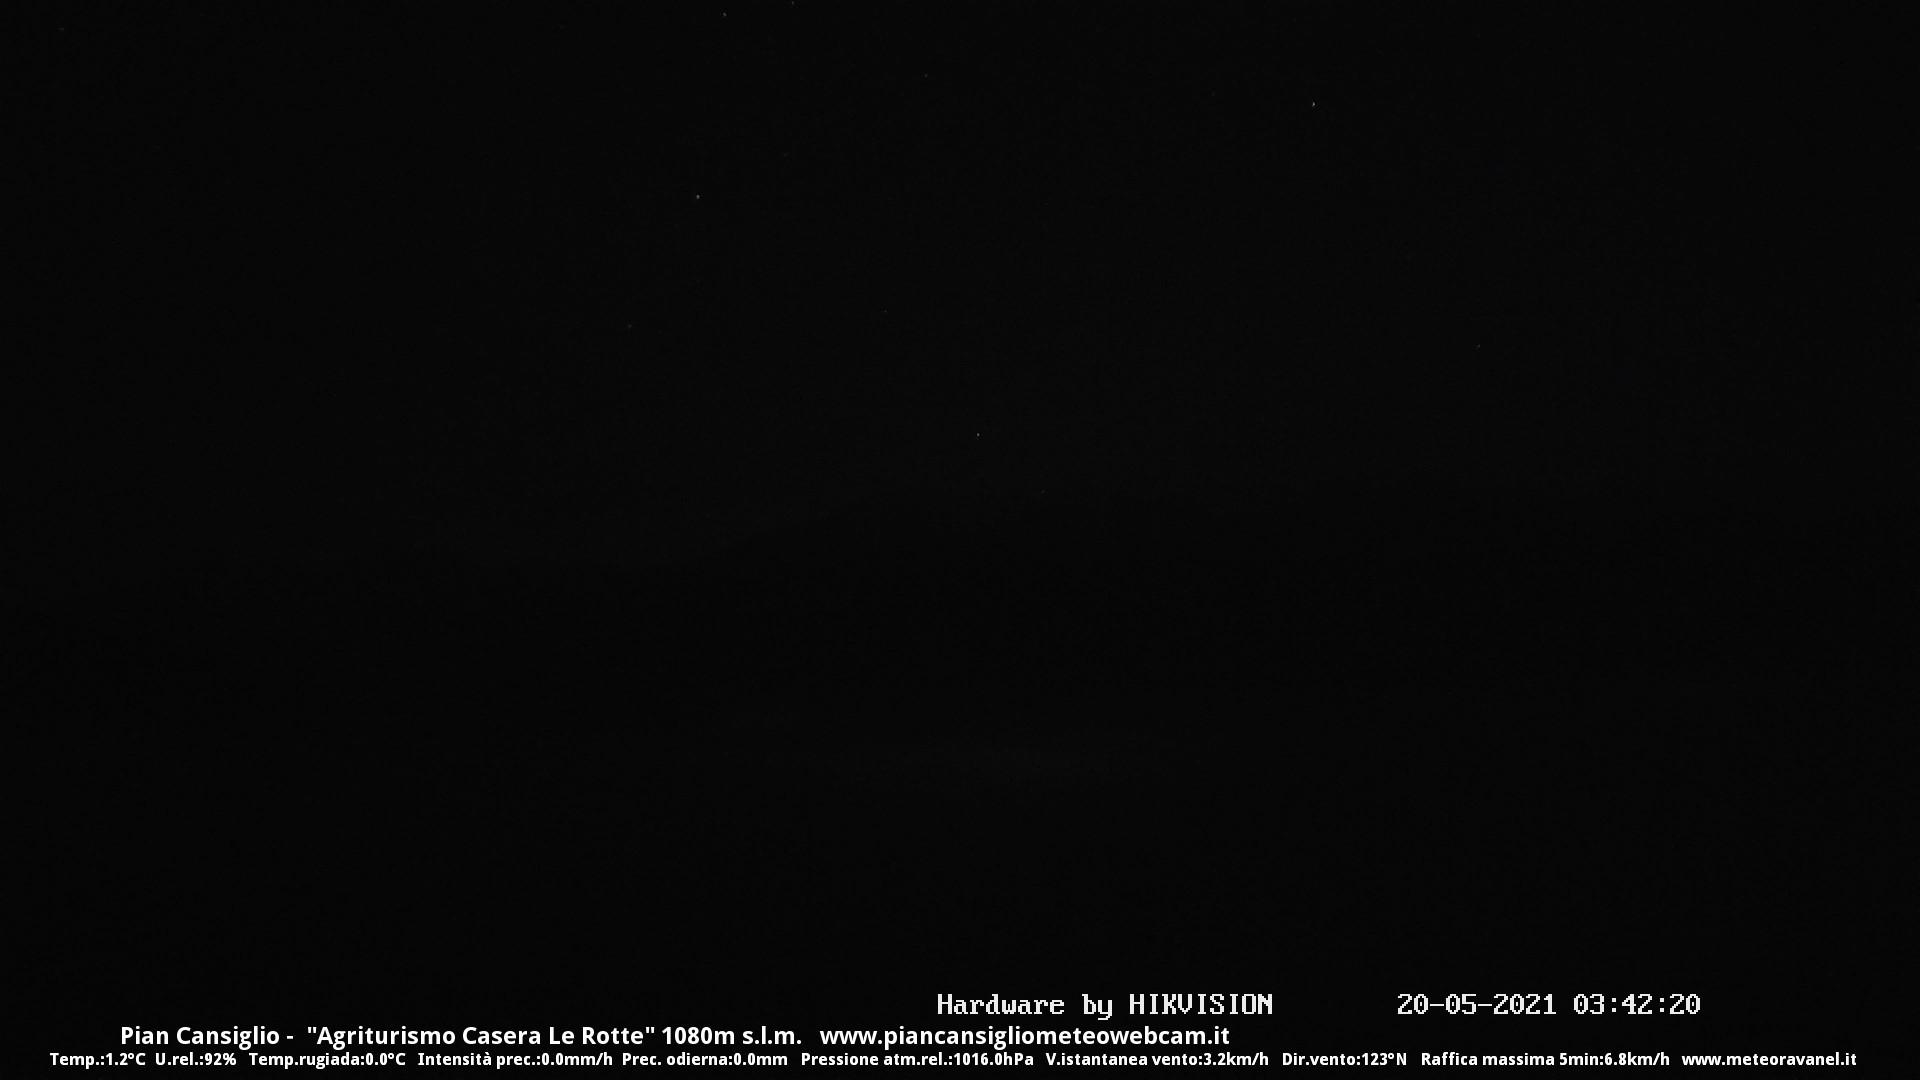 time-lapse frame, lerotte20.05.2021 webcam